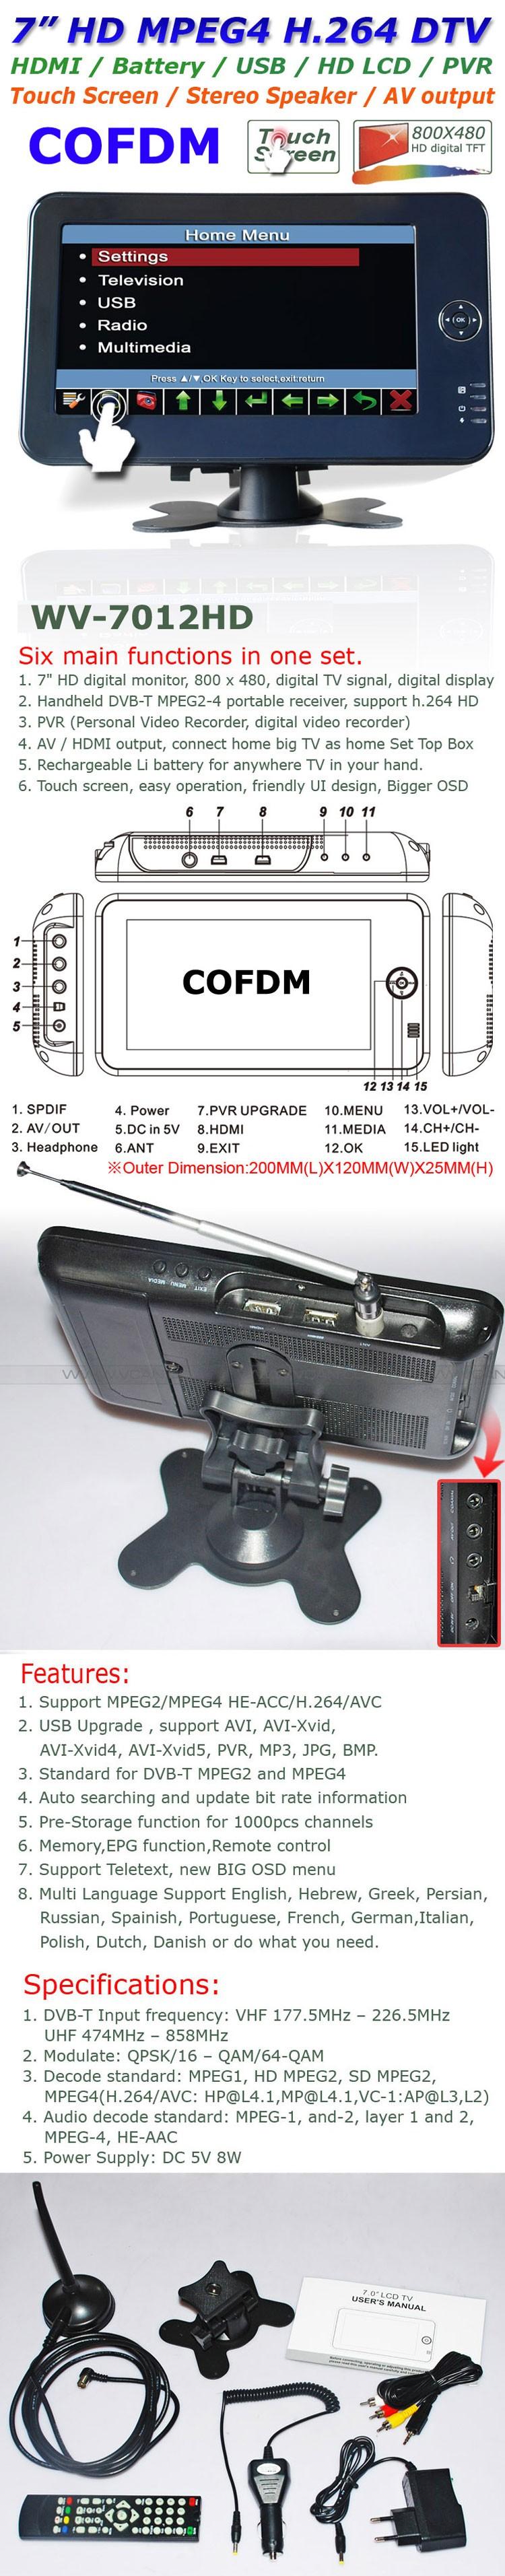 7 inch portable dvb-t lcd tv